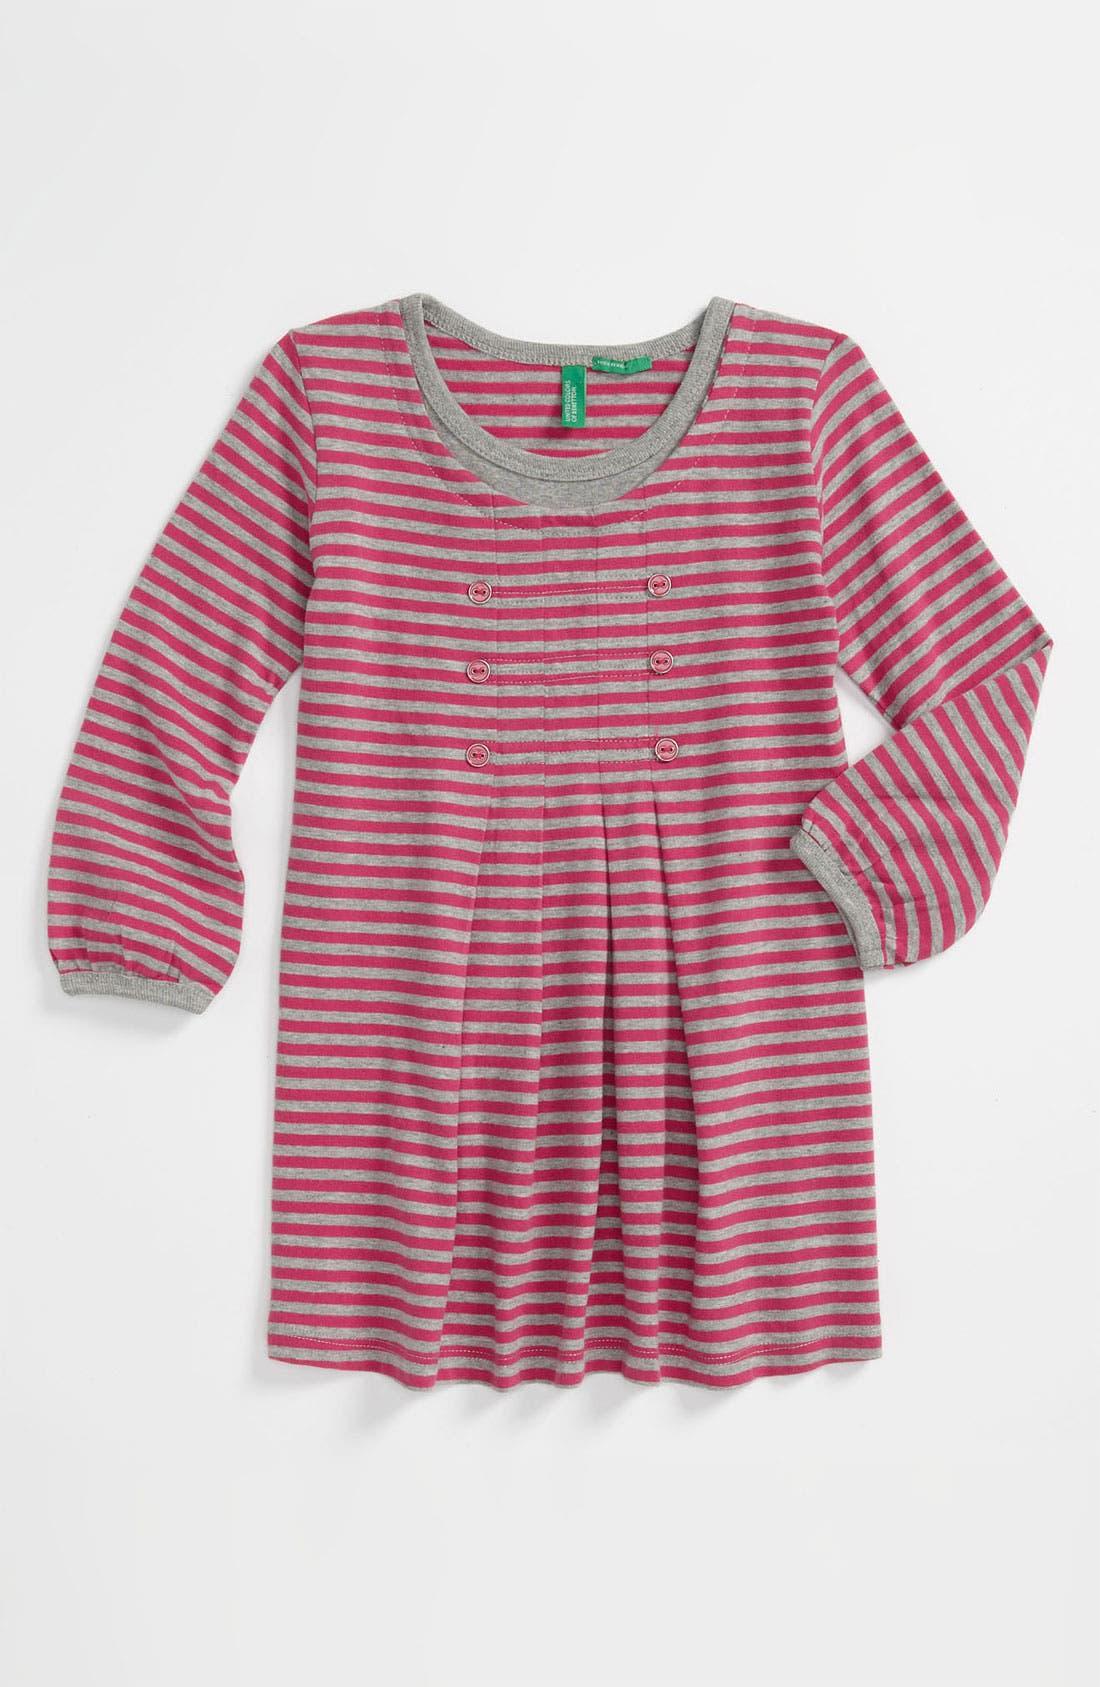 Alternate Image 1 Selected - United Colors of Benetton Kids Stripe Dress (Infant)